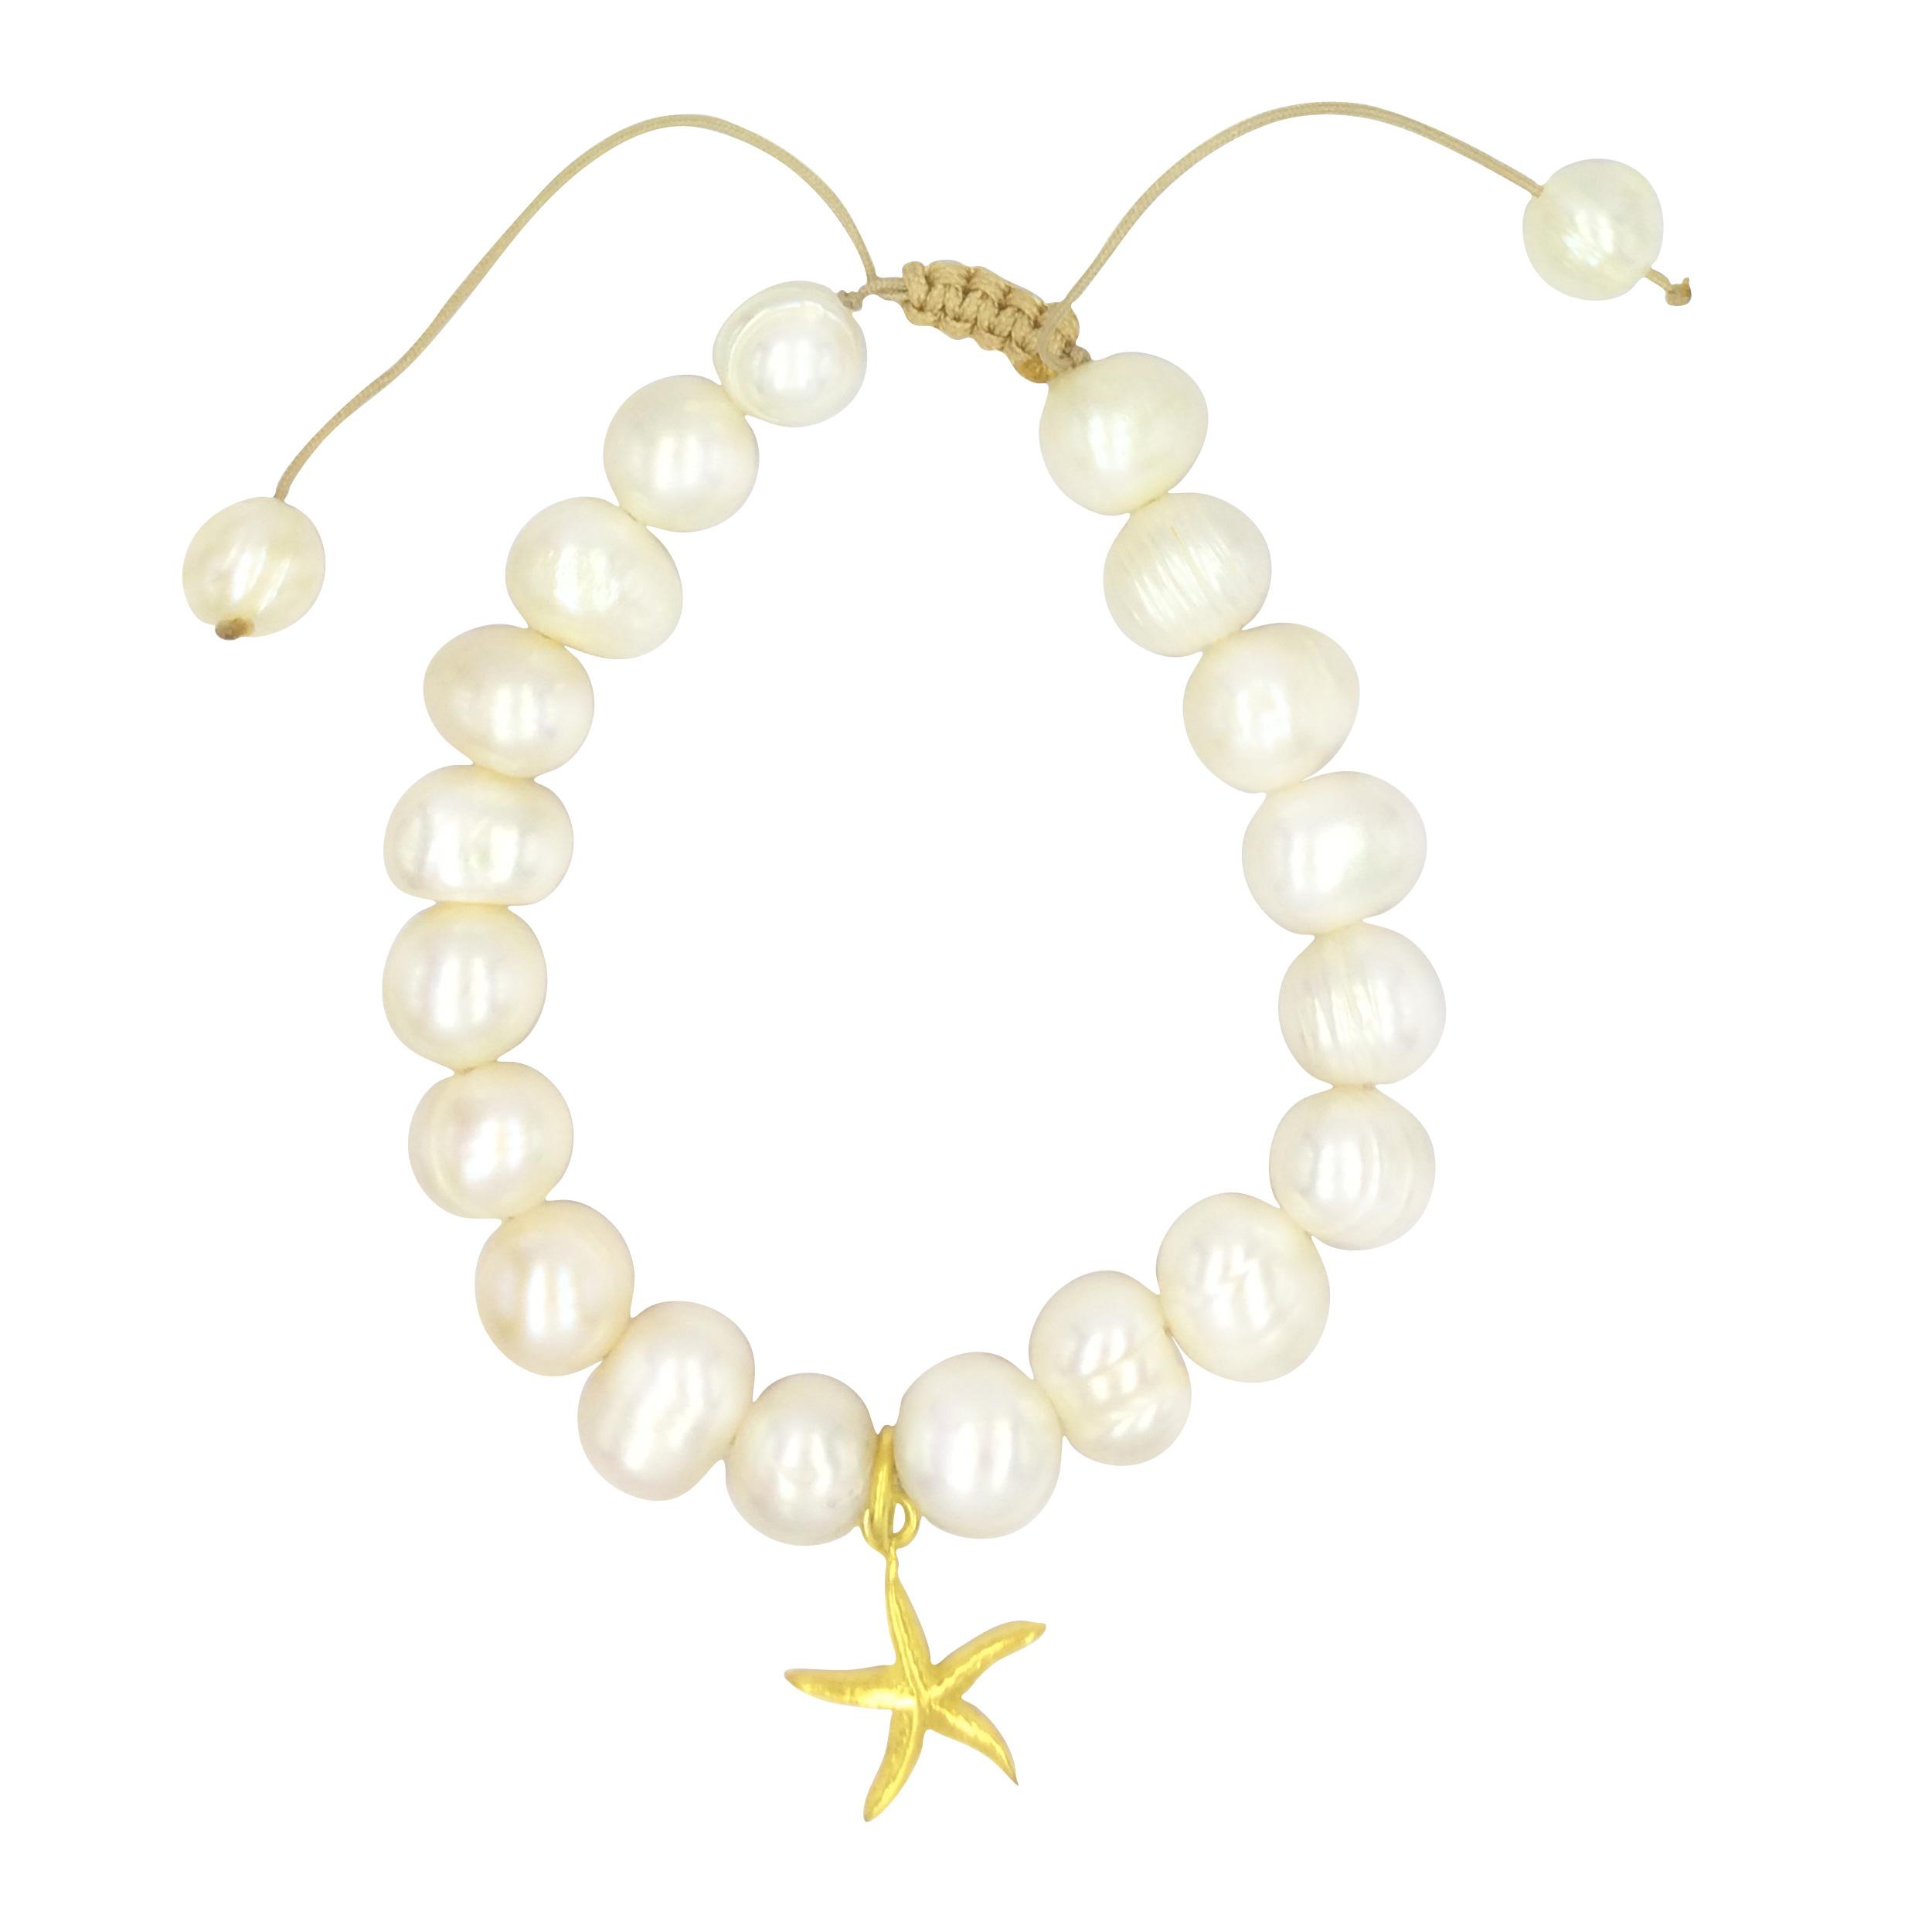 دستبند طلا 18 عیار زنانه الماسین آذر طرح ستاره کد 01